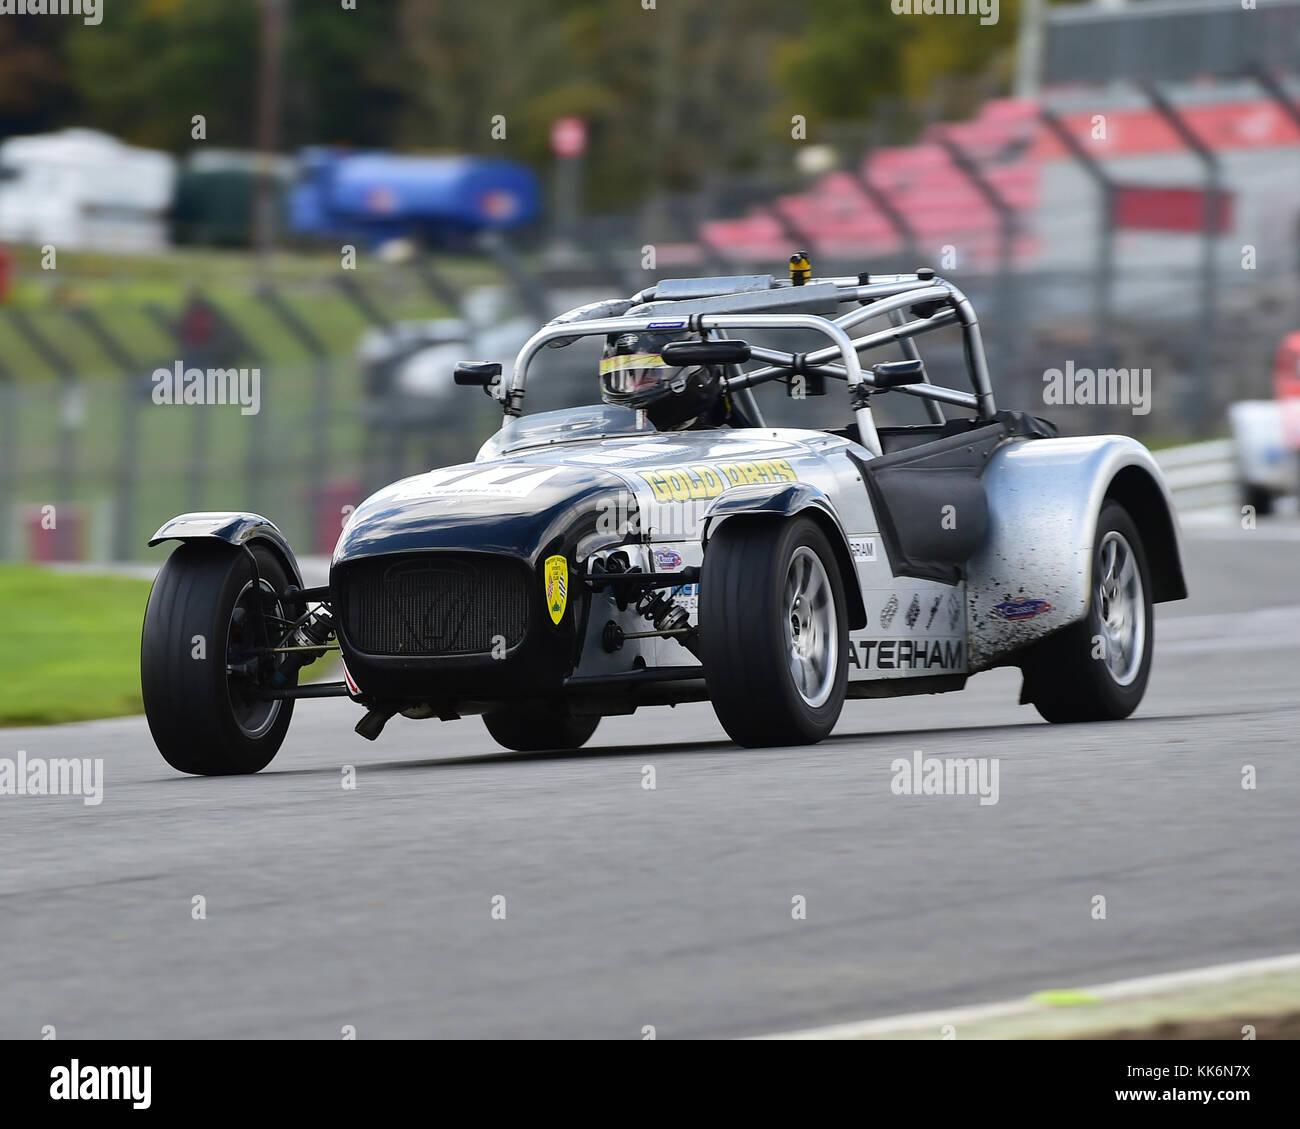 Caterham Sp 300r: Caterham Car Racing Stock Photos & Caterham Car Racing